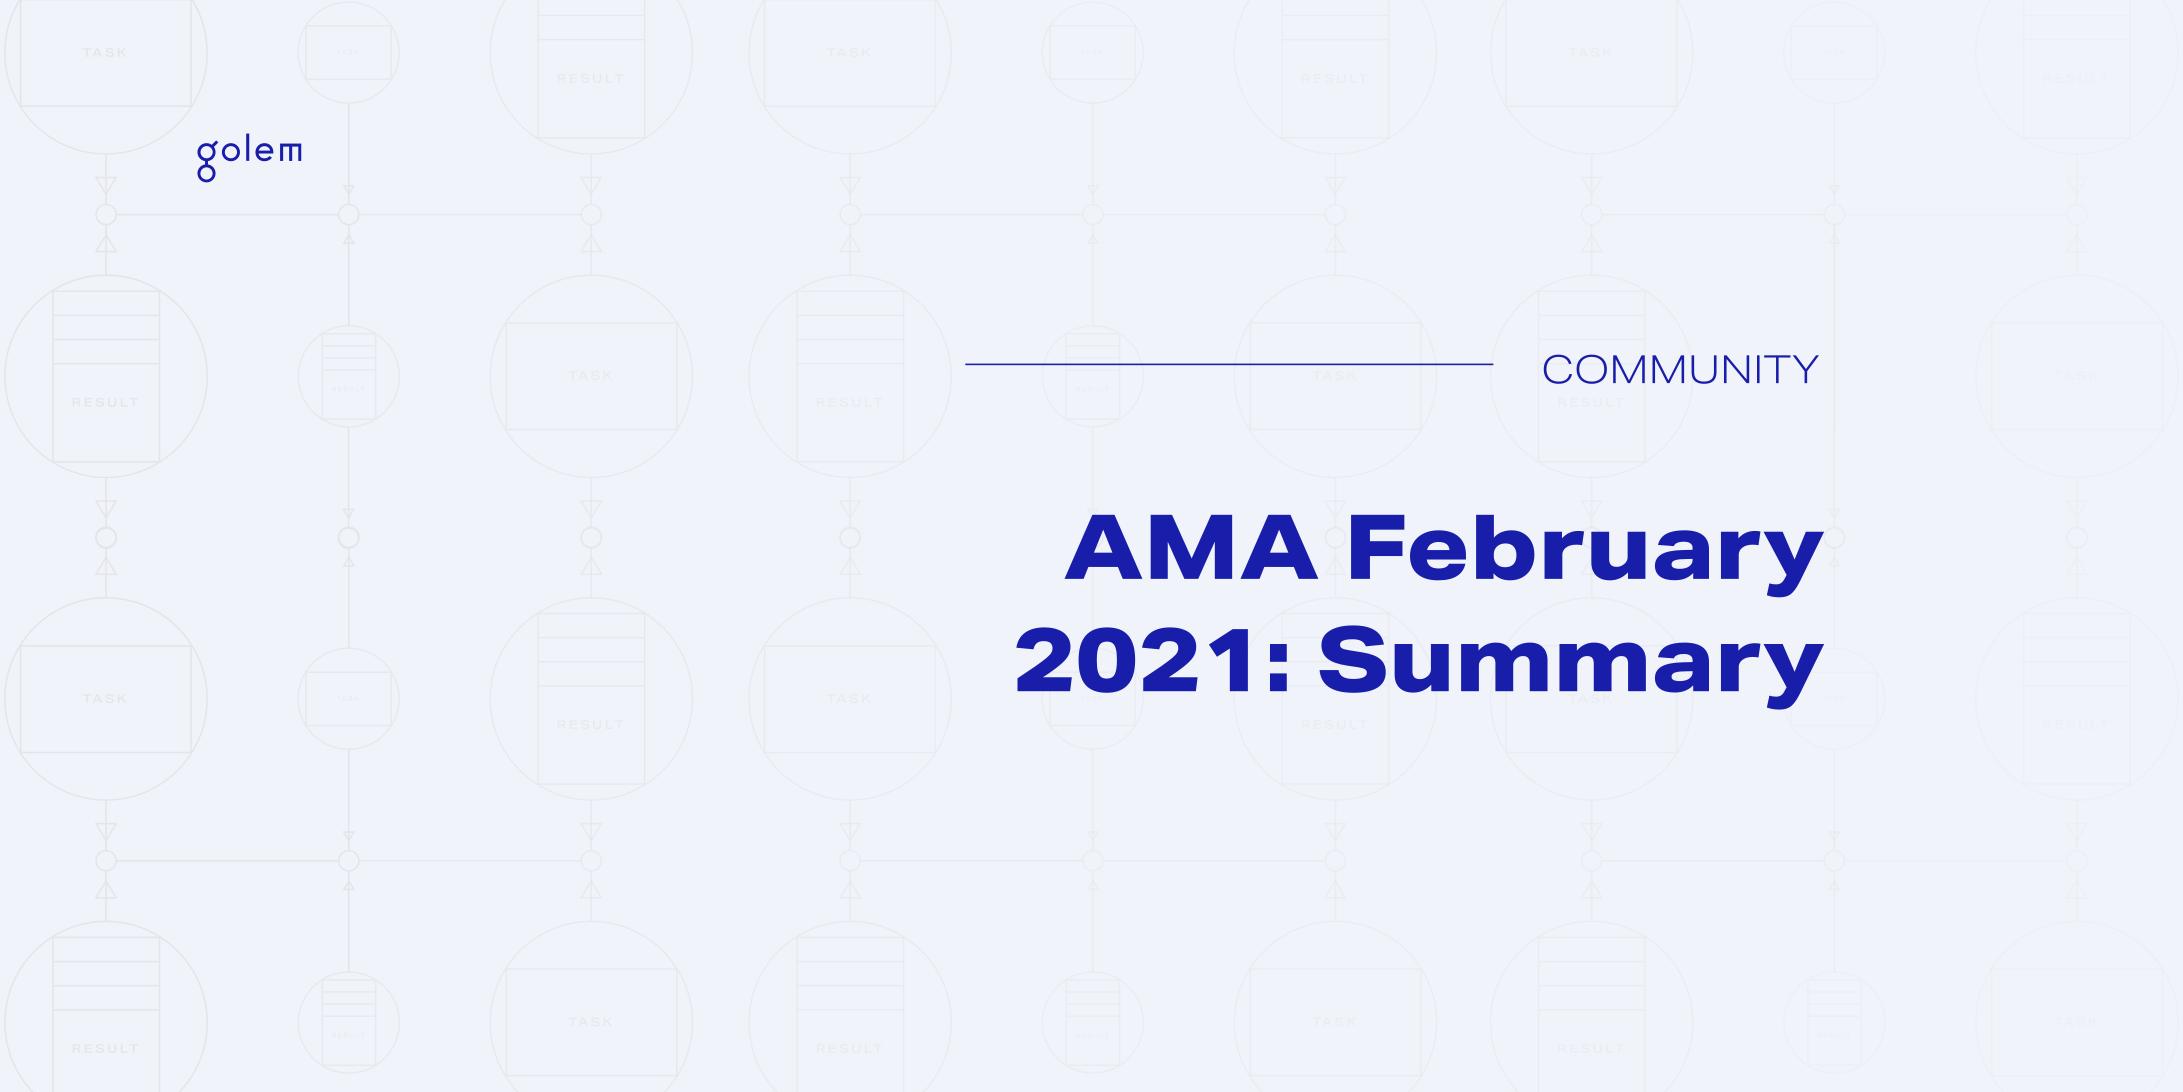 AMA February 2021 Summary